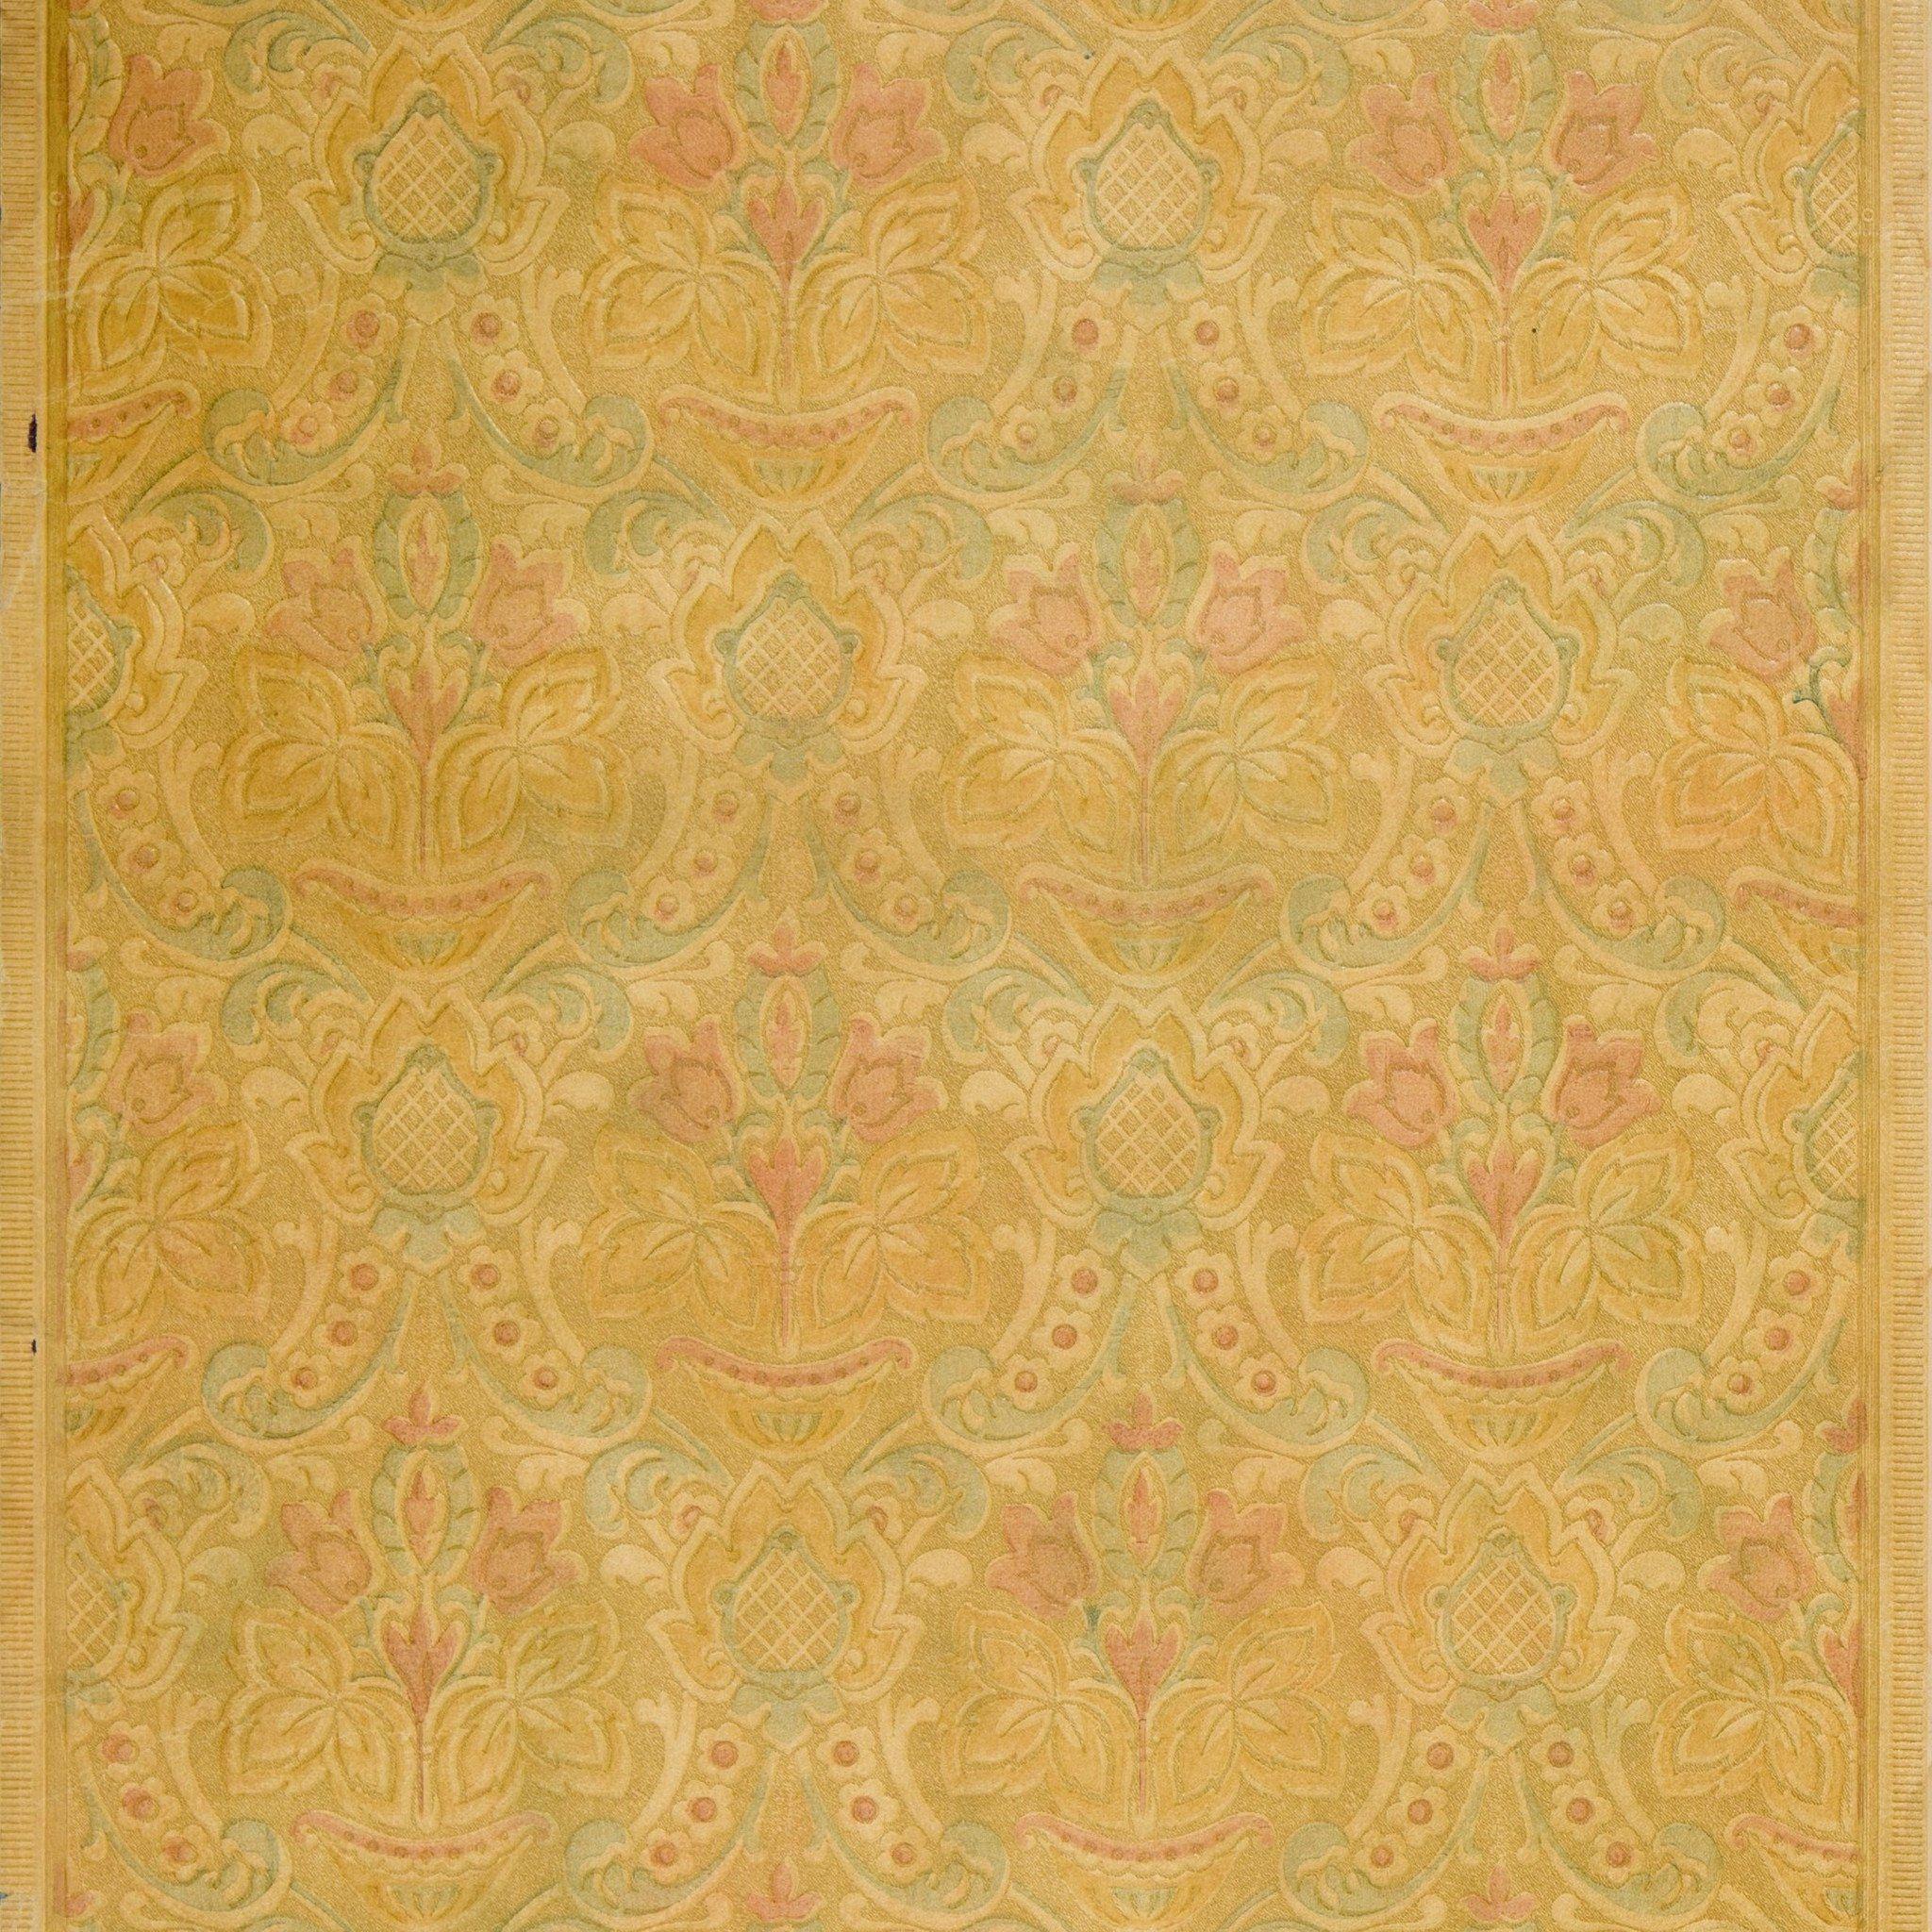 Embossed Baroque Floral Antique Wallpaper Remnant Antique Wallpaper Wallpapers Vintage Art Deco Wallpaper